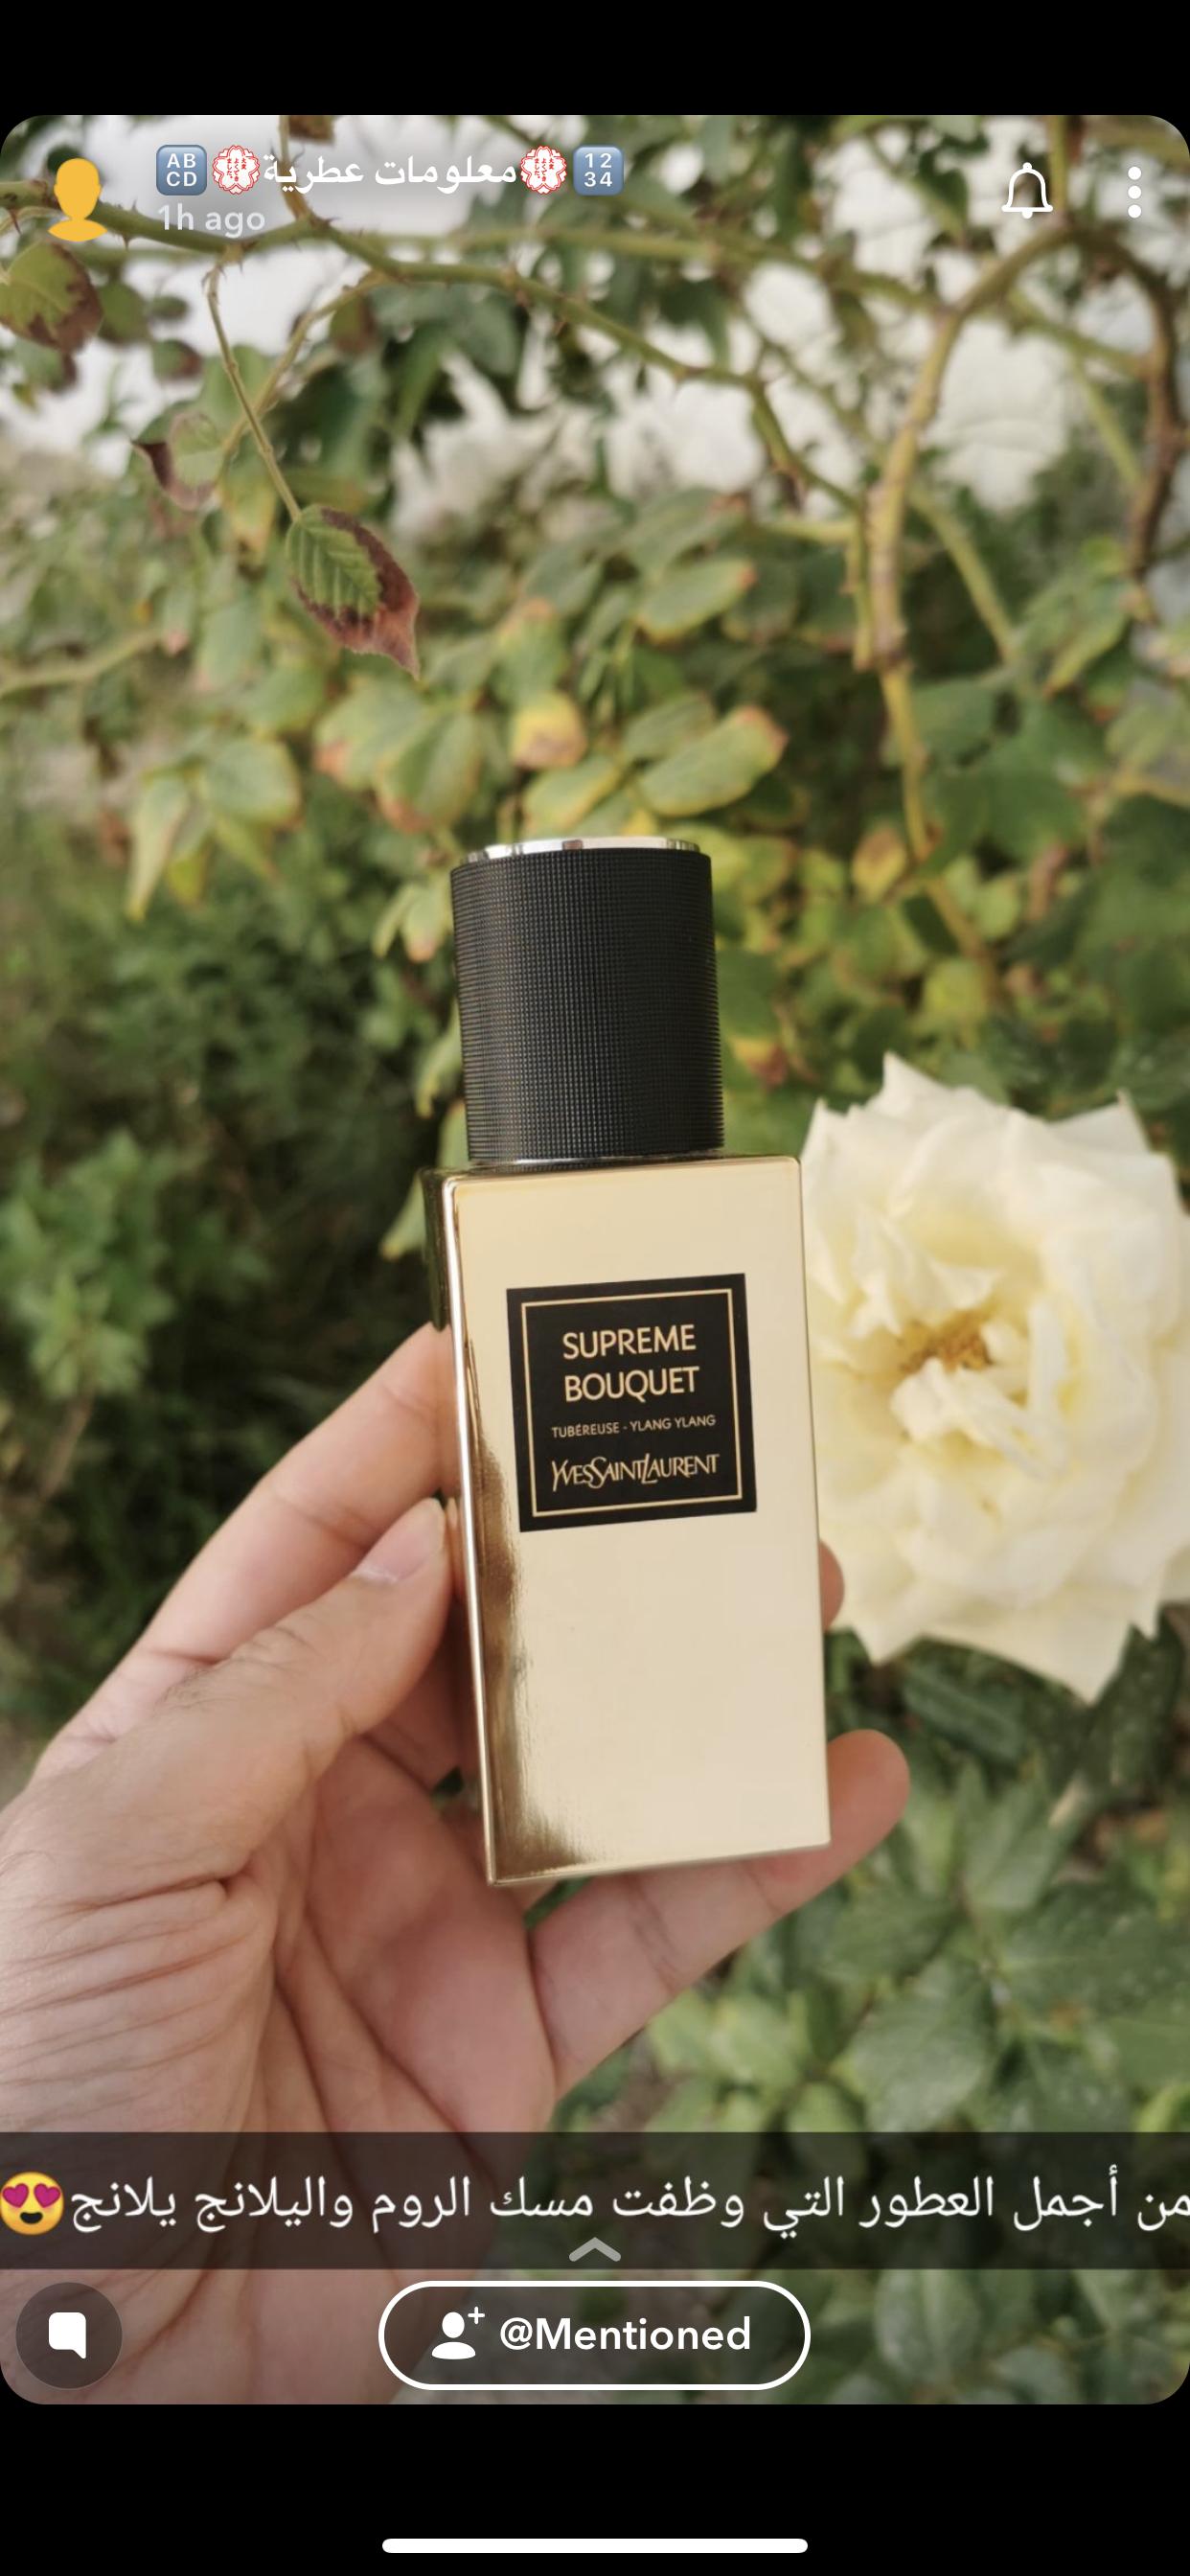 Pin By Samar Anan On عطور فرنسية Perfume Samples Perfume Perfume Bottles